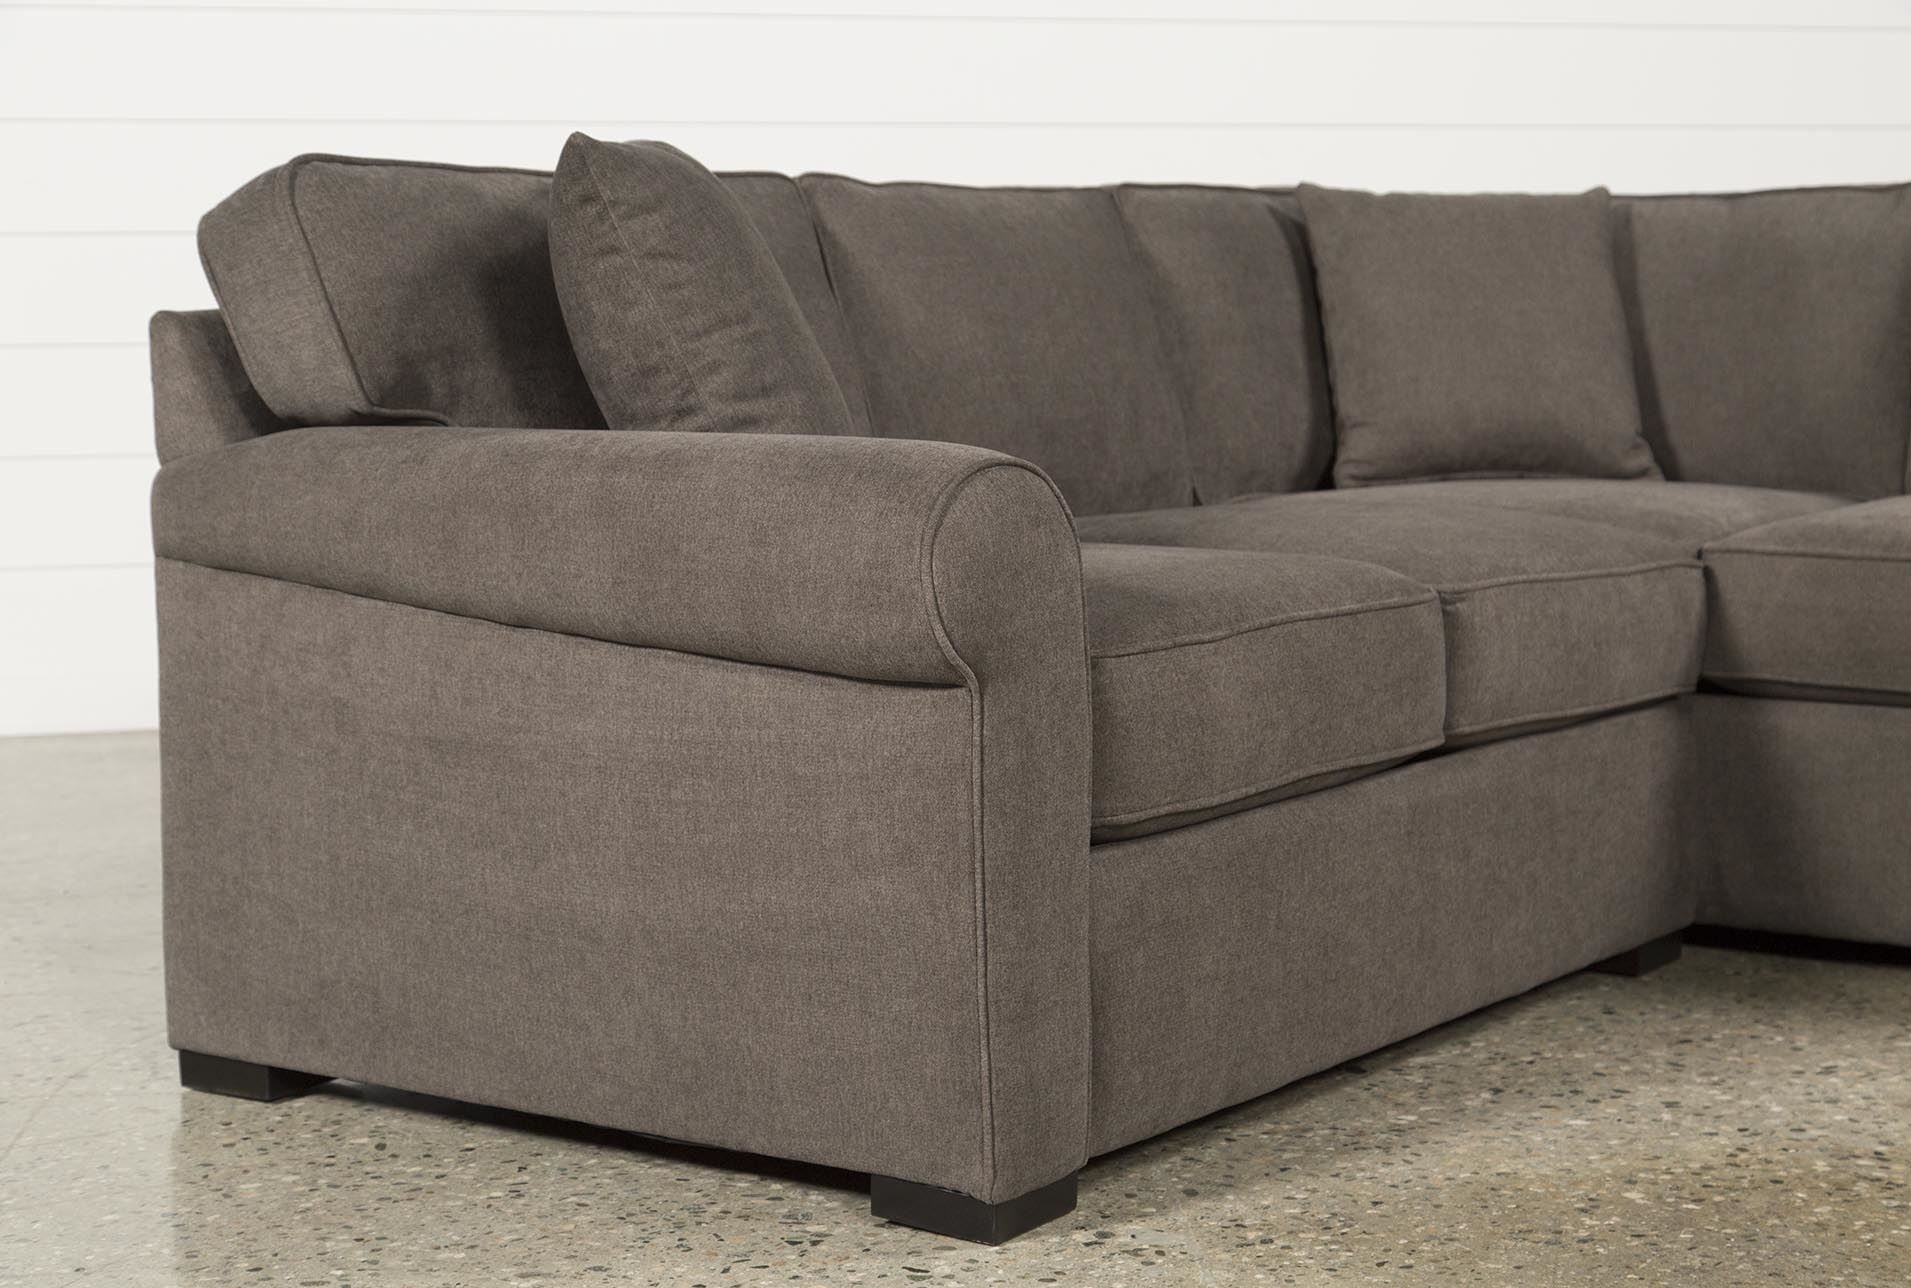 Elm Grande 2 Piece Sectional, Grey, Sofas | Room Inspiration Regarding Elm Grande Ii 2 Piece Sectionals (Image 14 of 25)